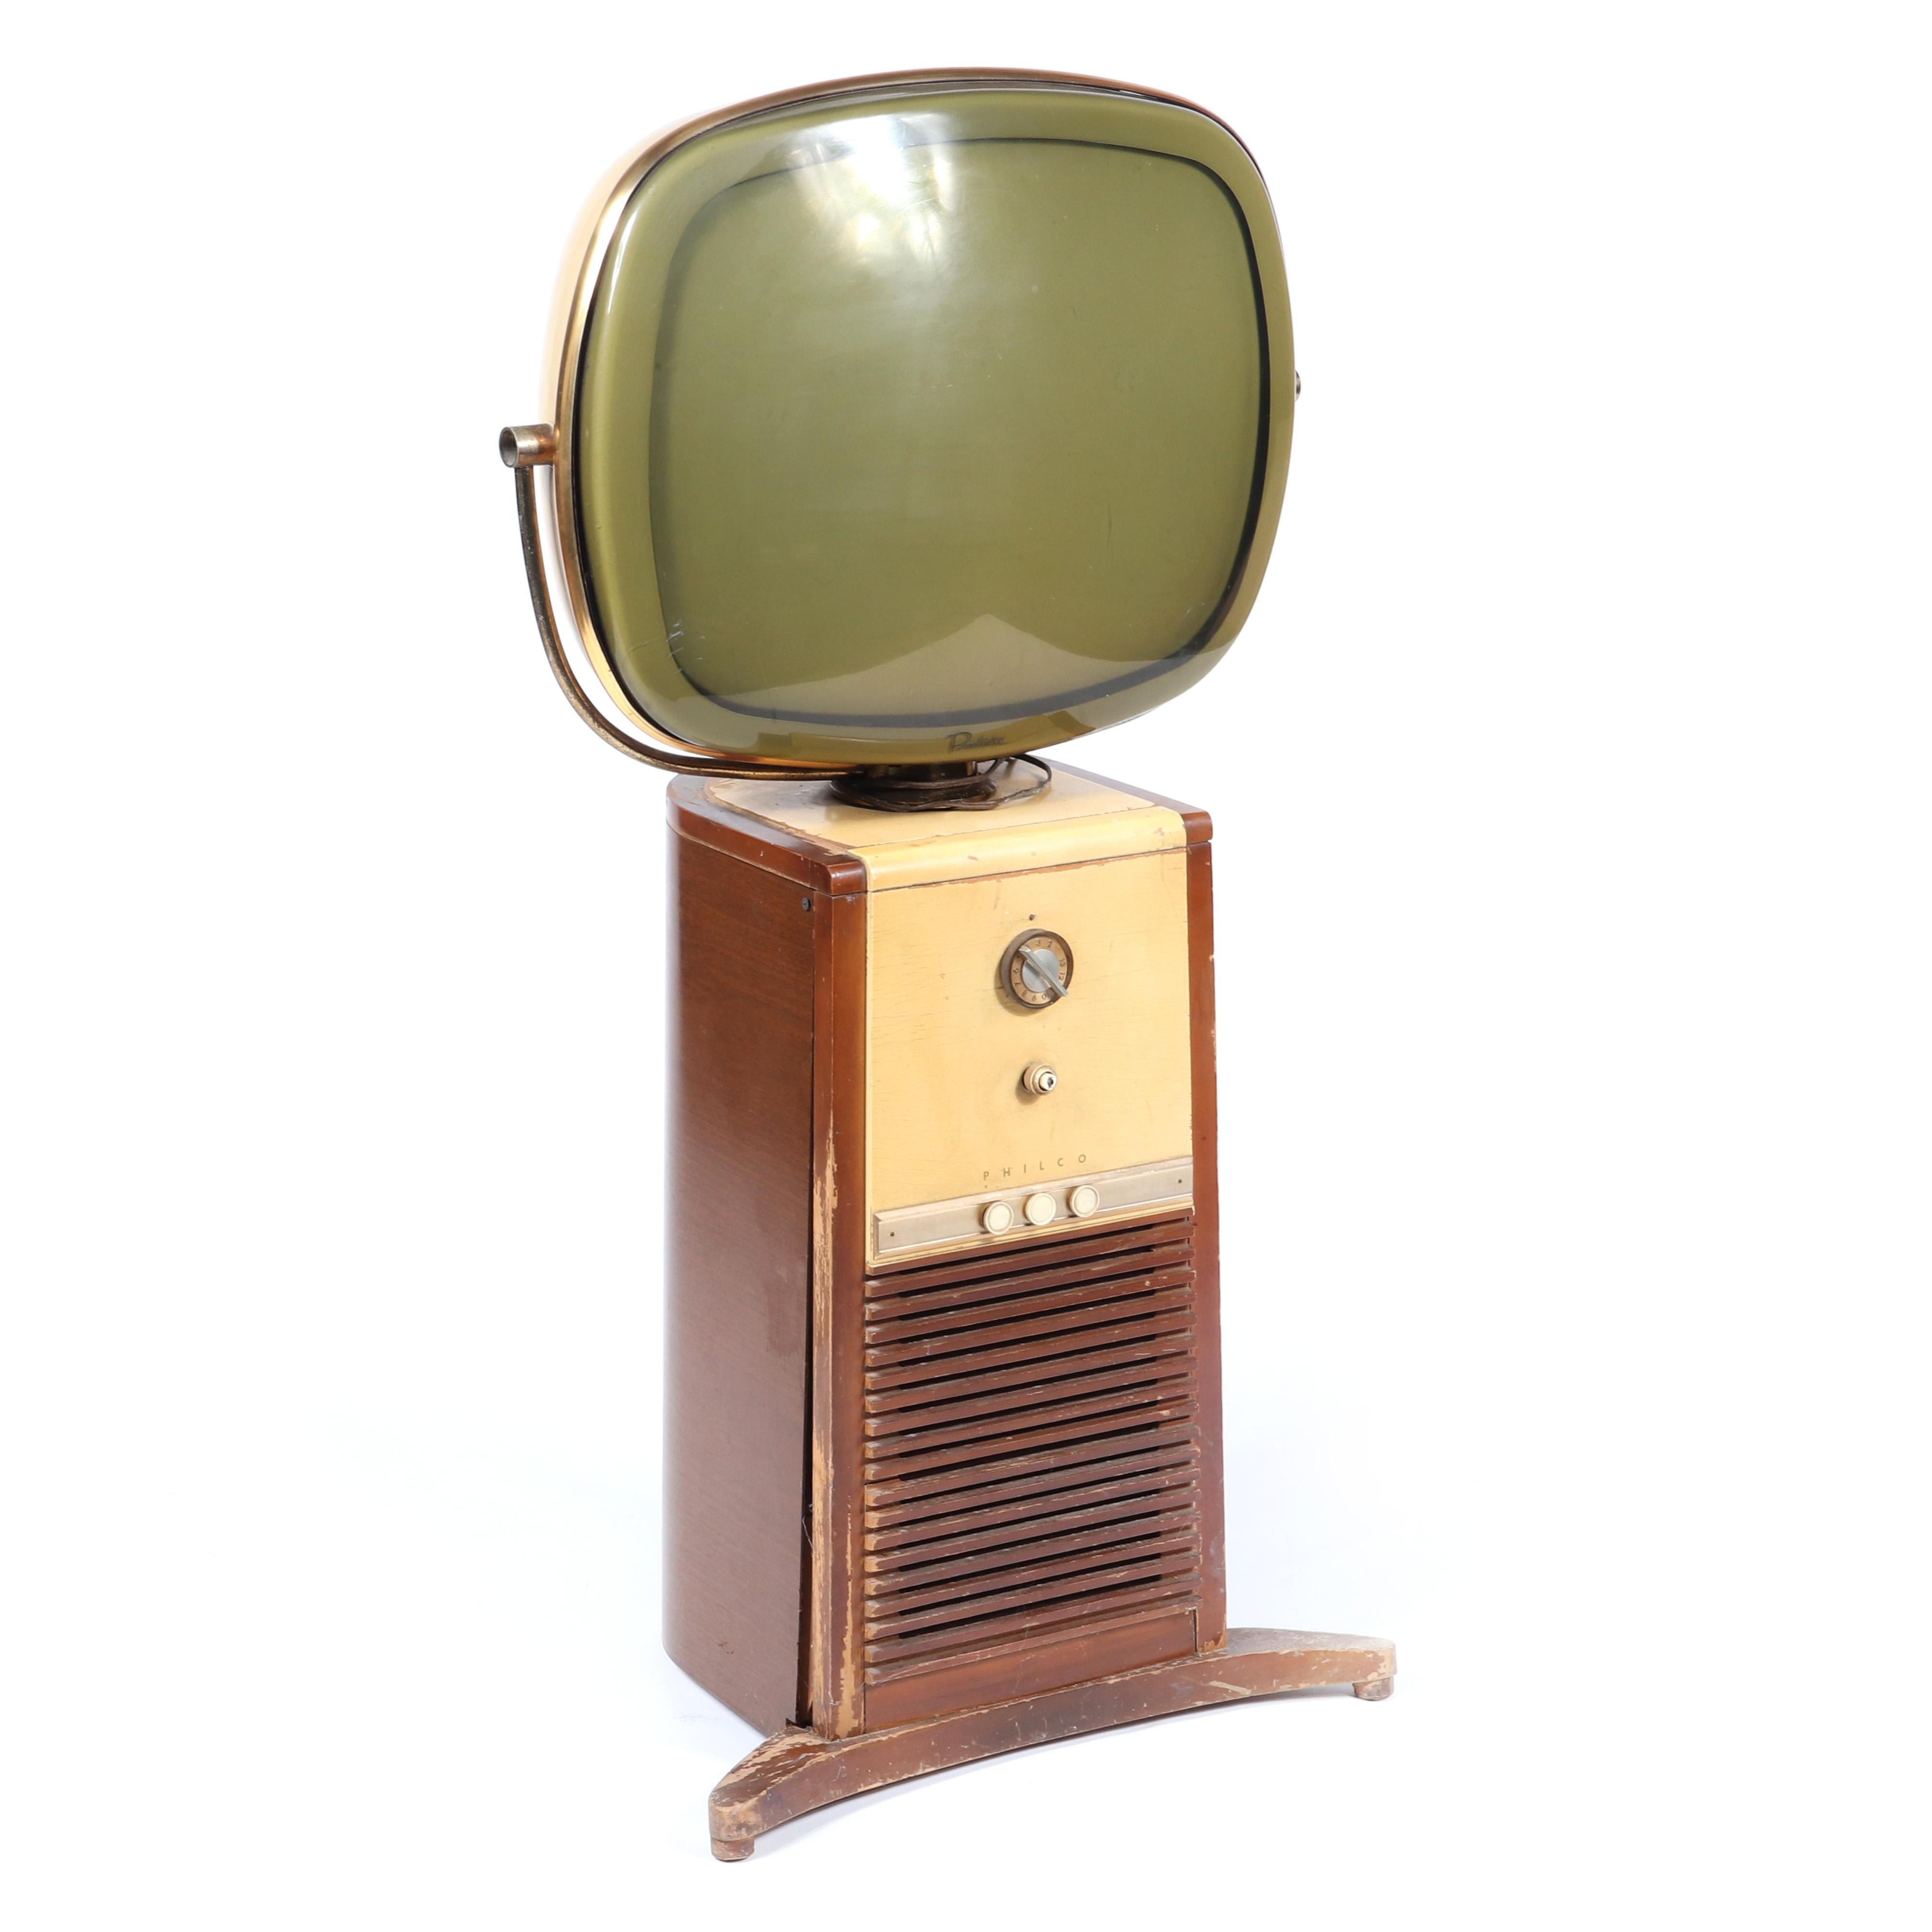 "Vintage Philco Predicta early floor model 'Pedestal' Television / TV set, 1958. 44""H x 24""W."